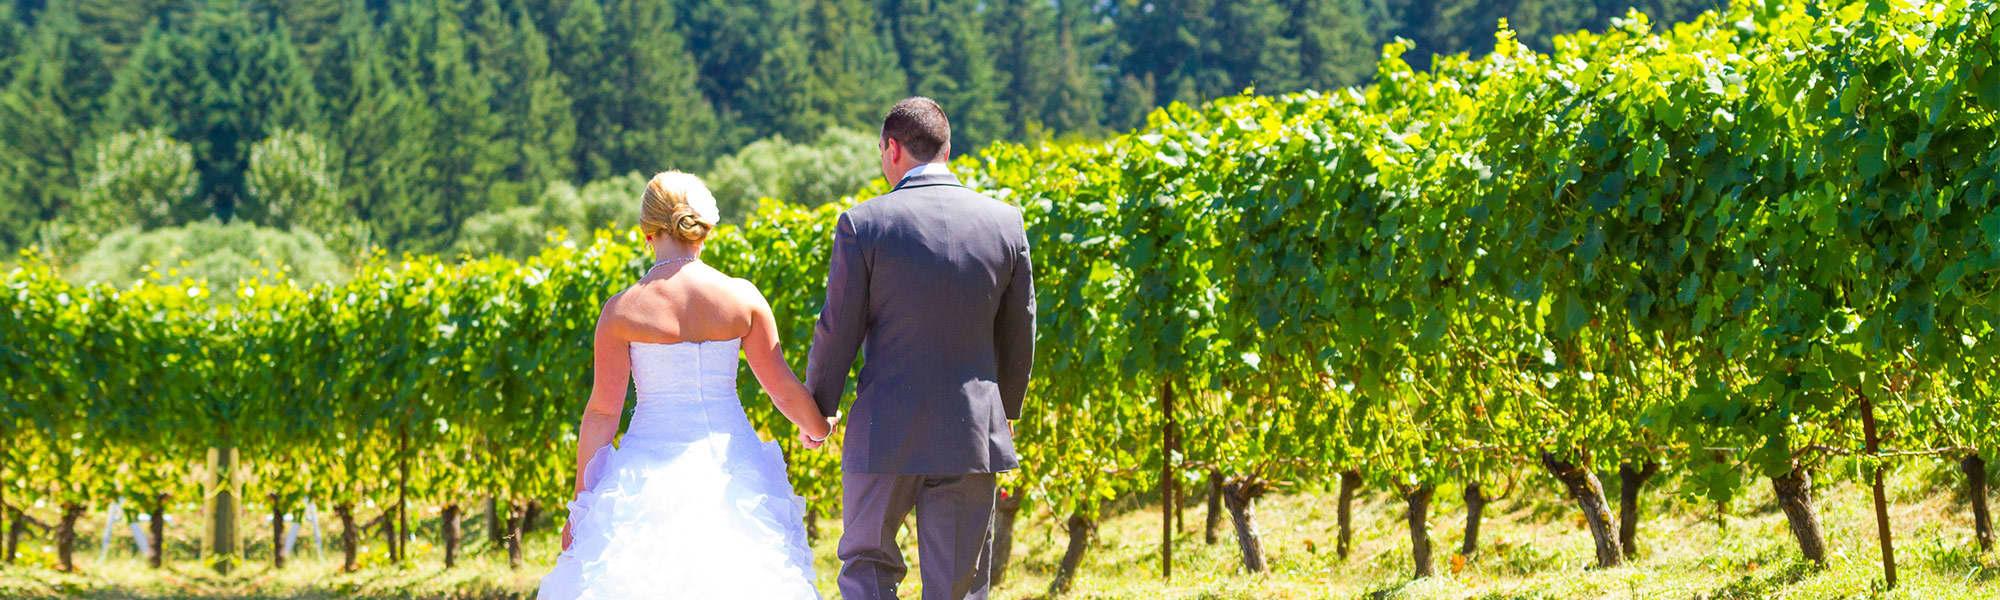 Weddings at Hotel Los Gatos - A Greystone Hotel